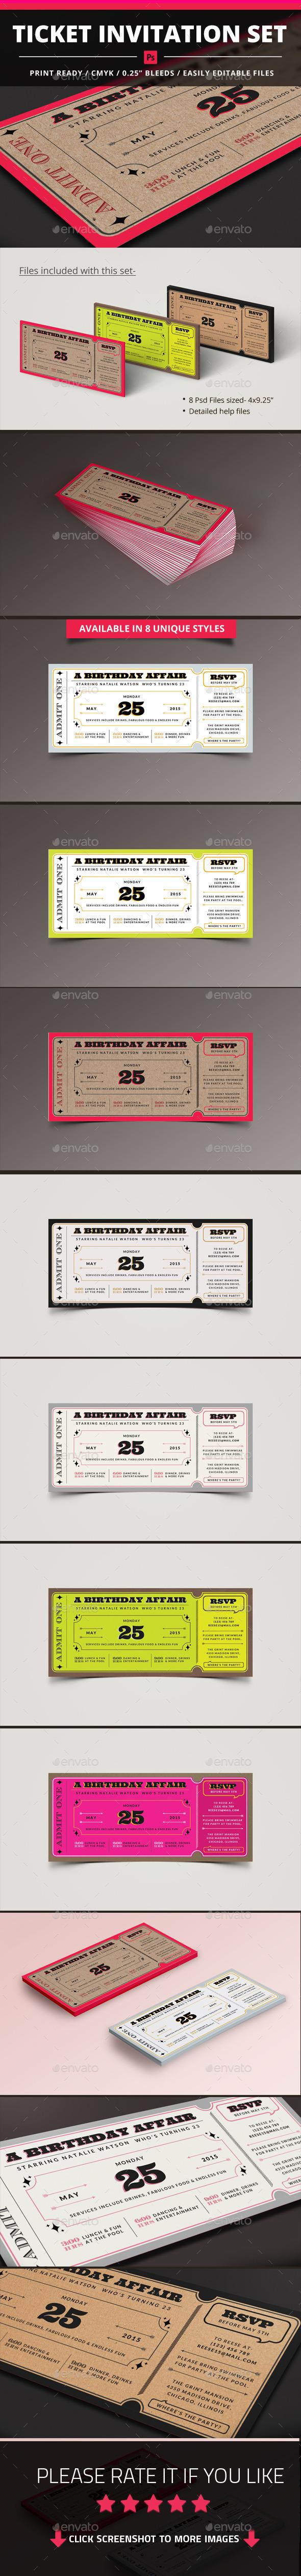 GraphicRiver Ticket Invitation Set 11303106